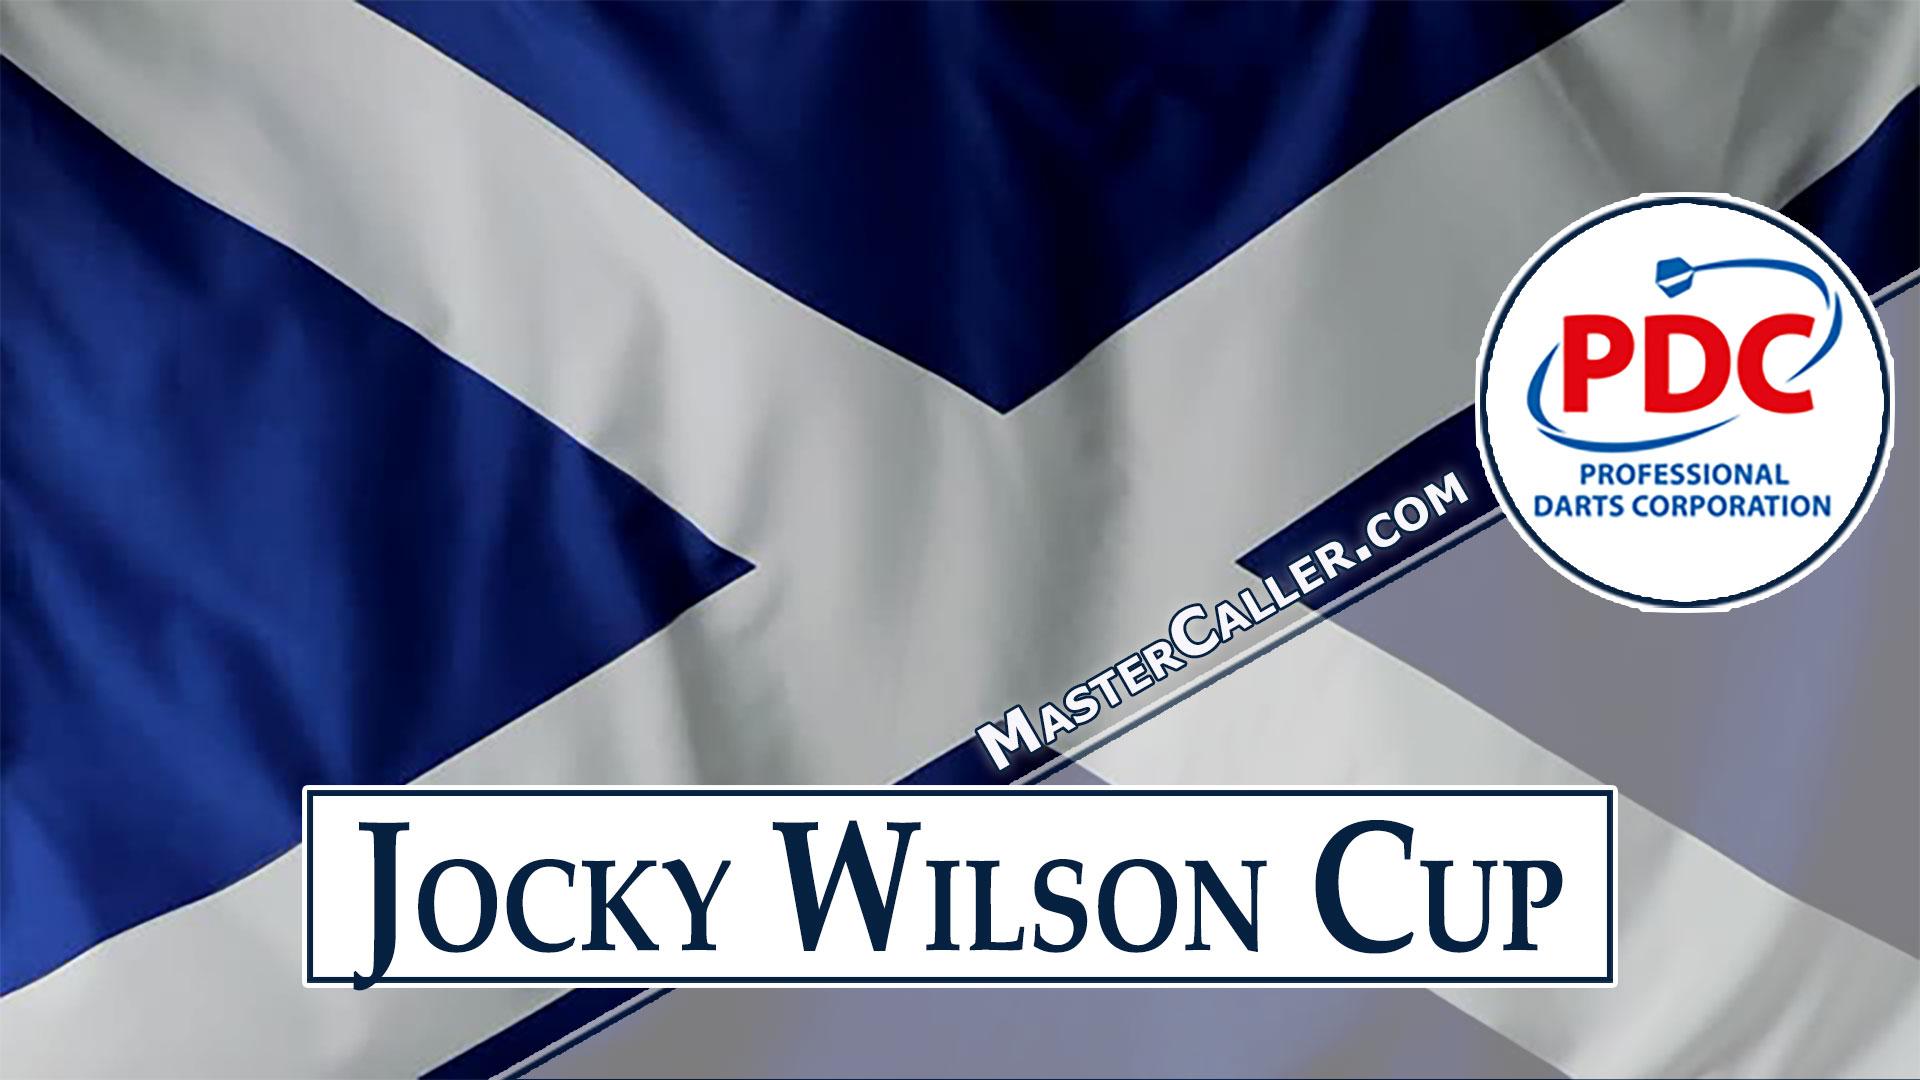 Jocky Wilson Cup - 2009 Logo